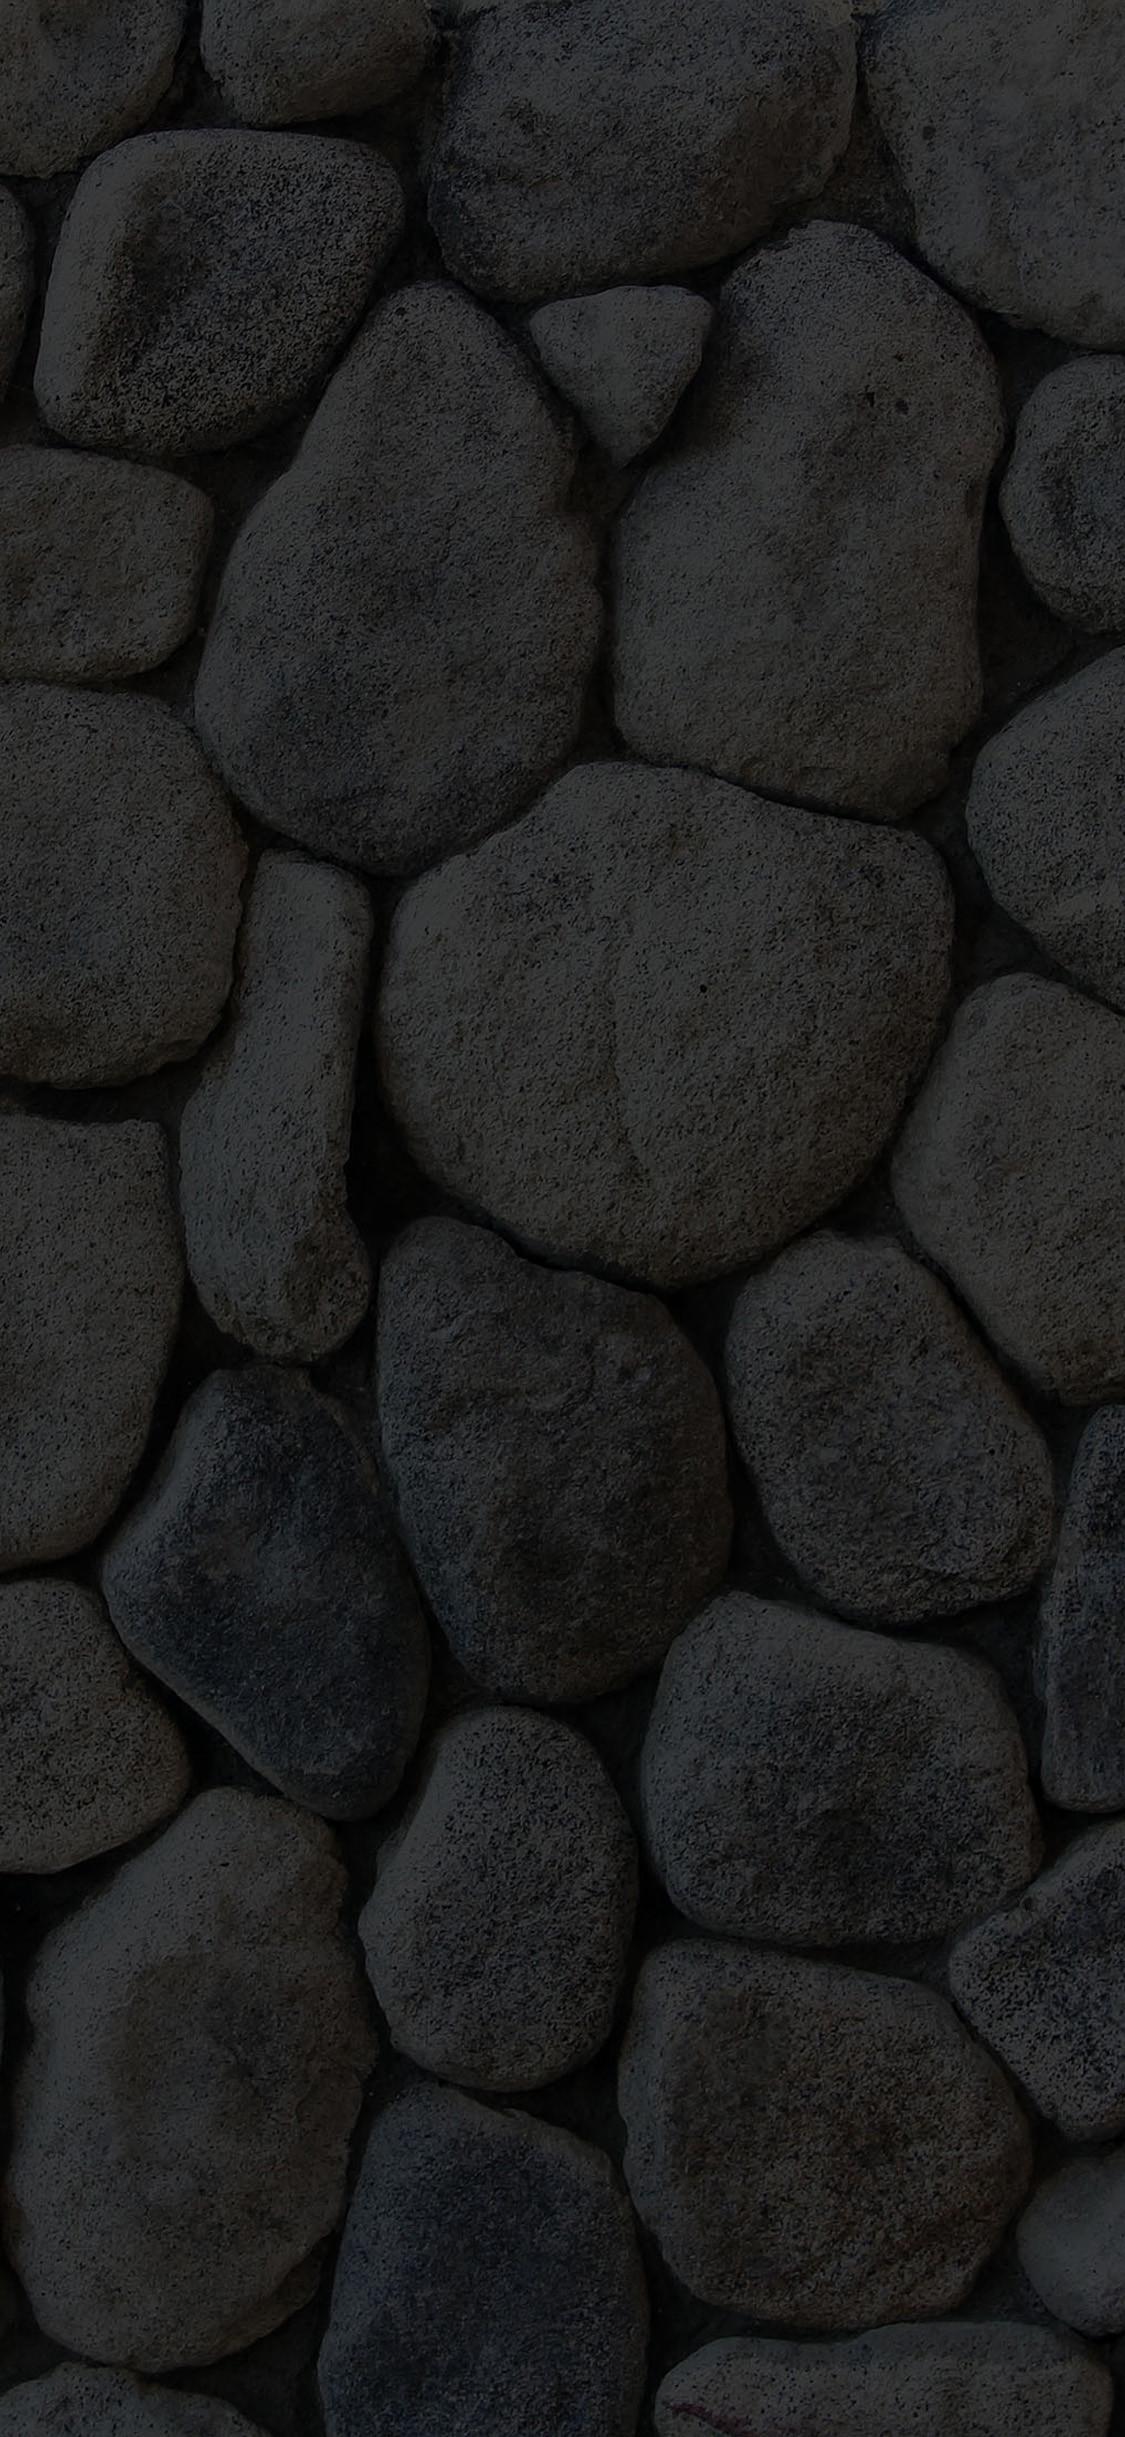 Black Stone Wallpaper 61 Images